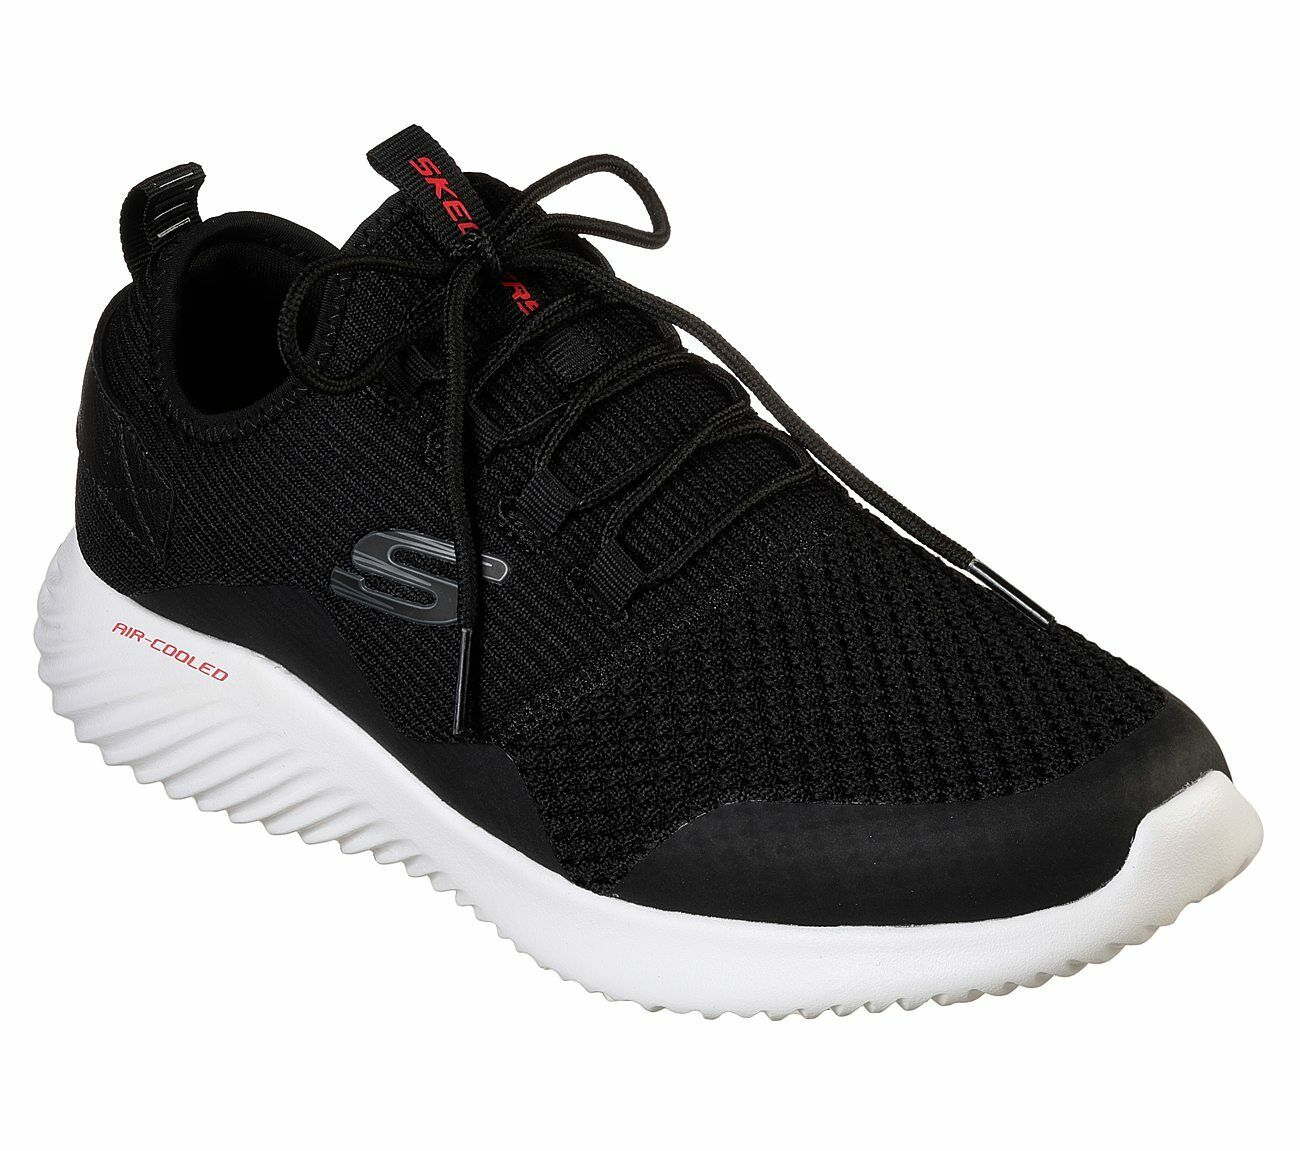 Skechers Black shoes Men Memory Foam Comfort Casual Sport Train Walk Mesh 52510